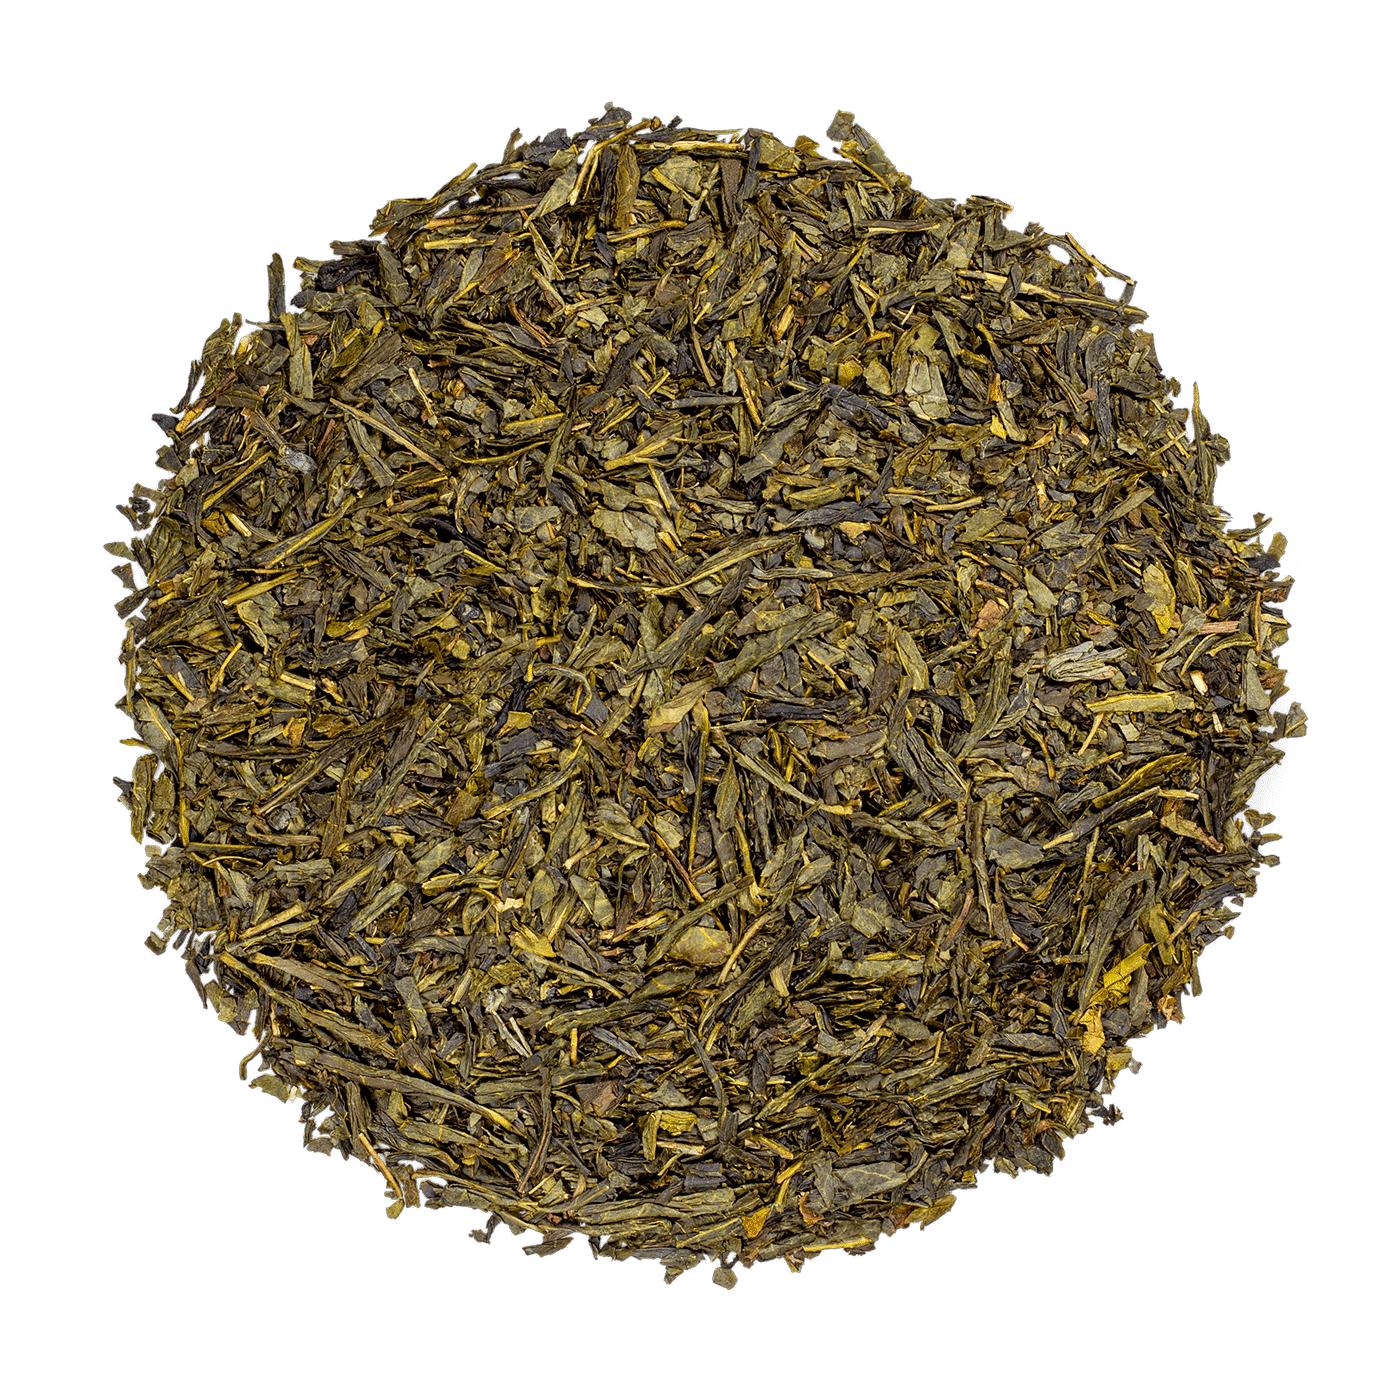 KUSMI TEA Vert Fraise Bio - Thé vert saveur fraise - Thé en vrac - Kusmi Tea